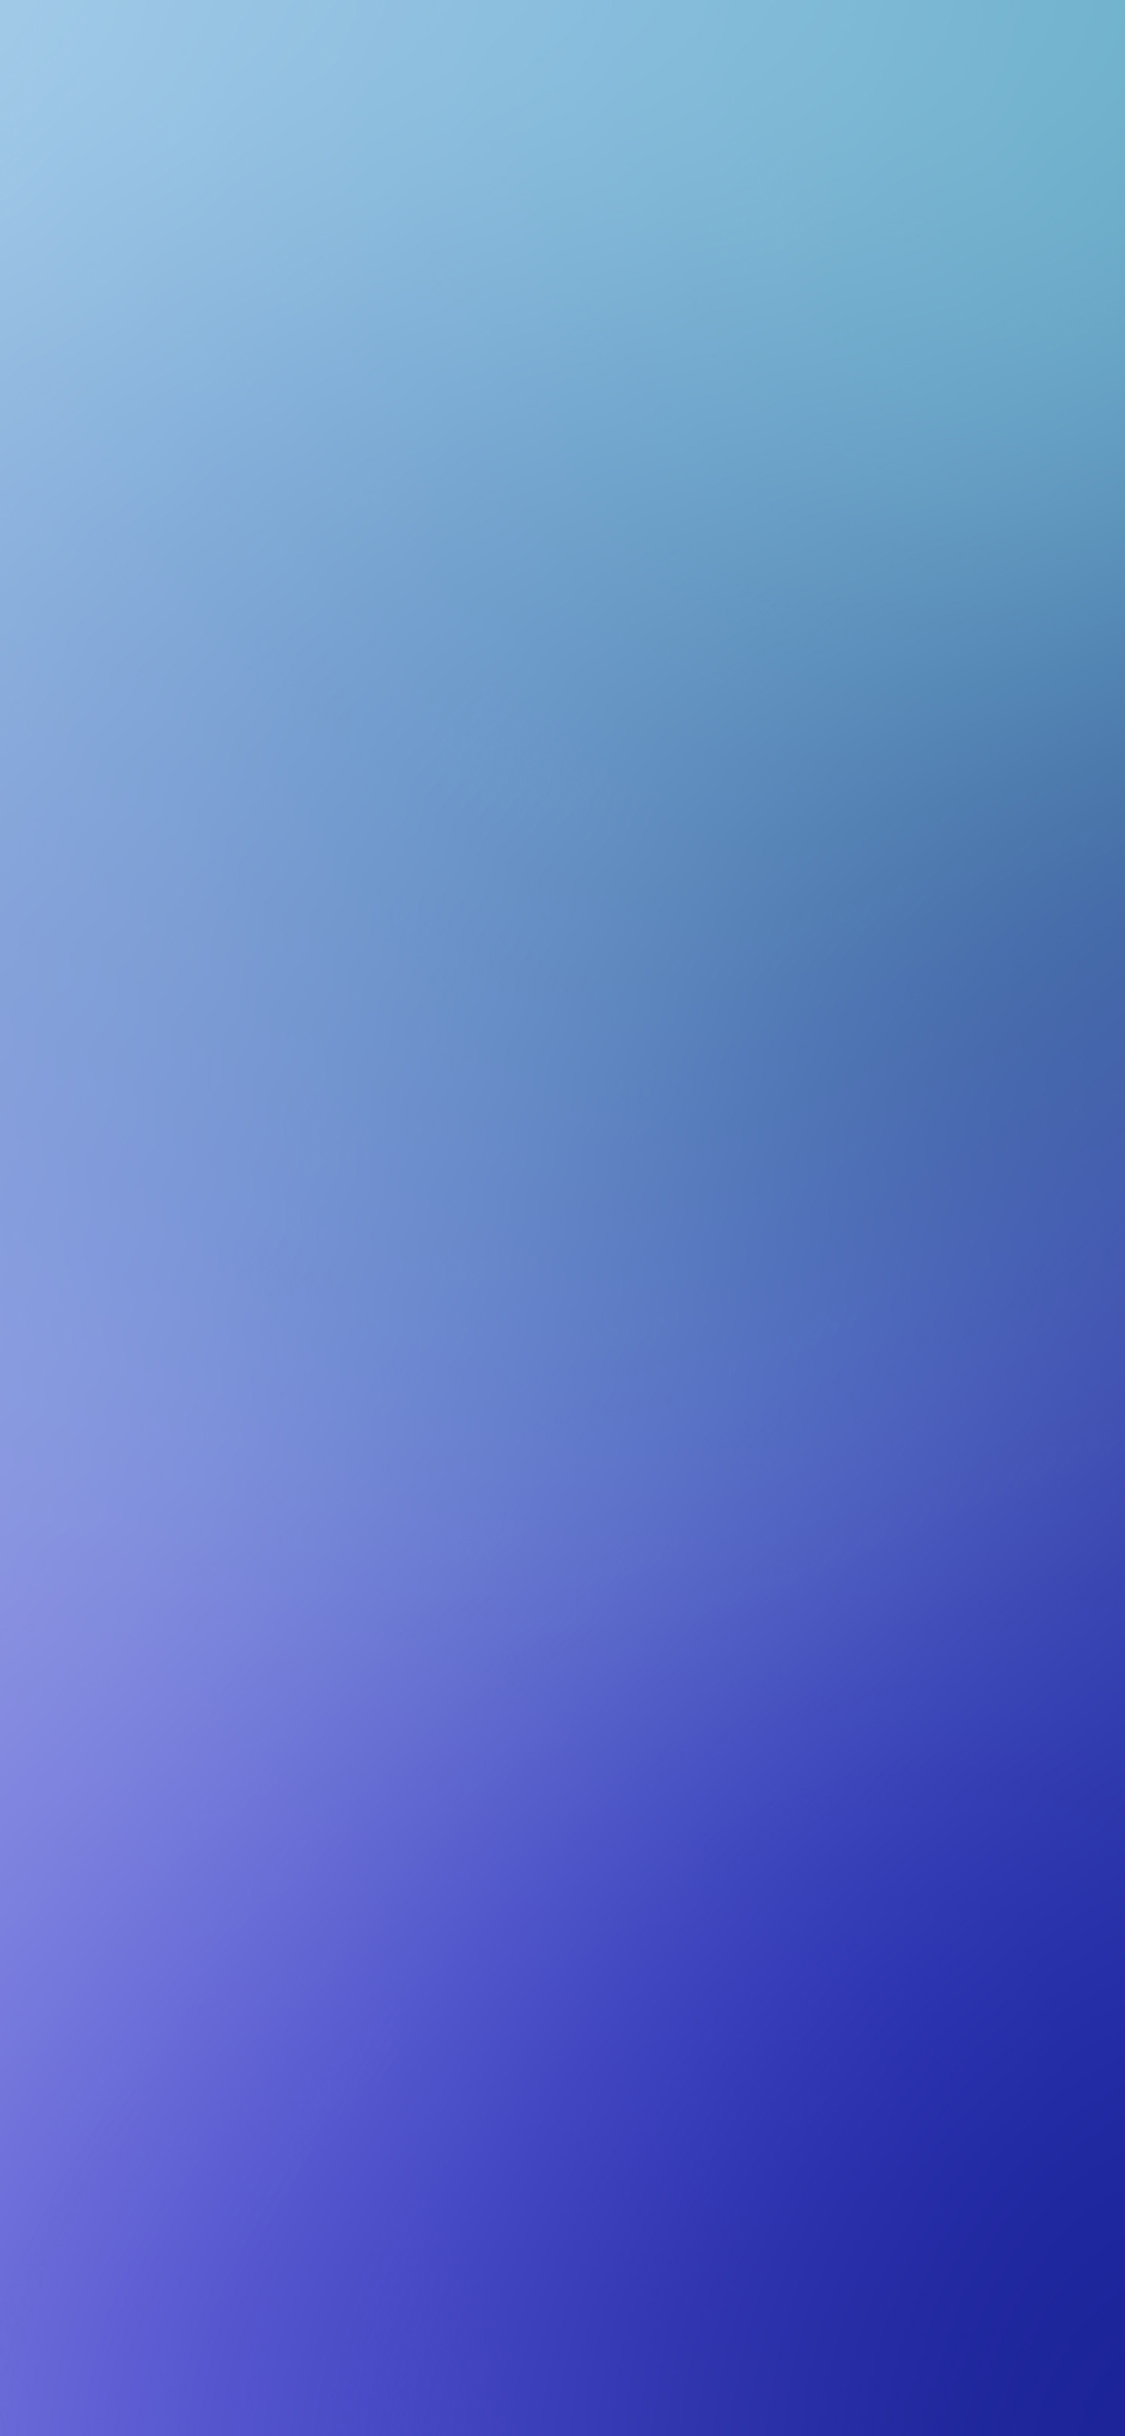 iPhoneXpapers.com-Apple-iPhone-wallpaper-sd68-blue-water-sex-gradation-blur